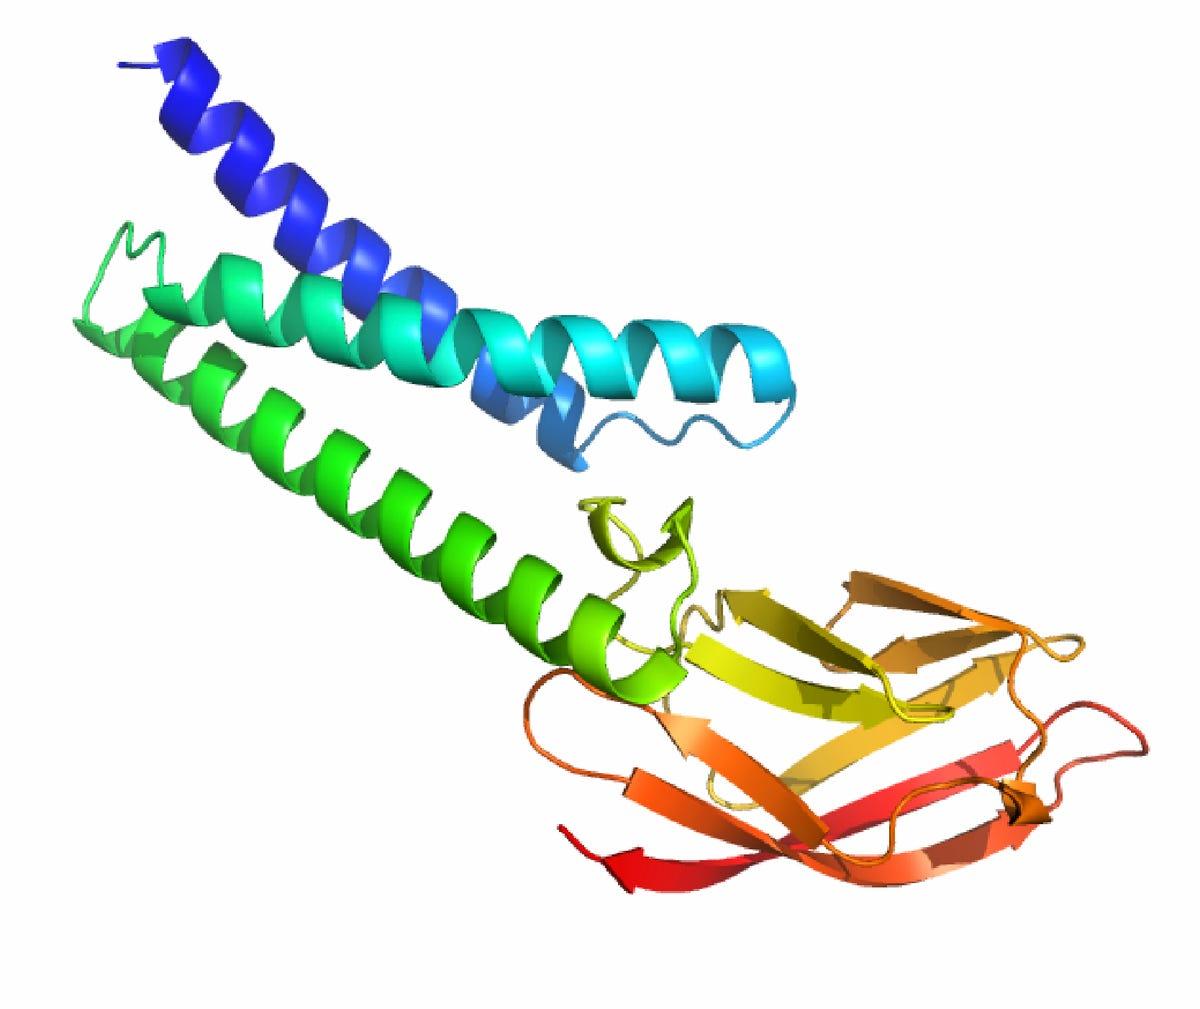 deepmind-coronavirus-protein-image.png